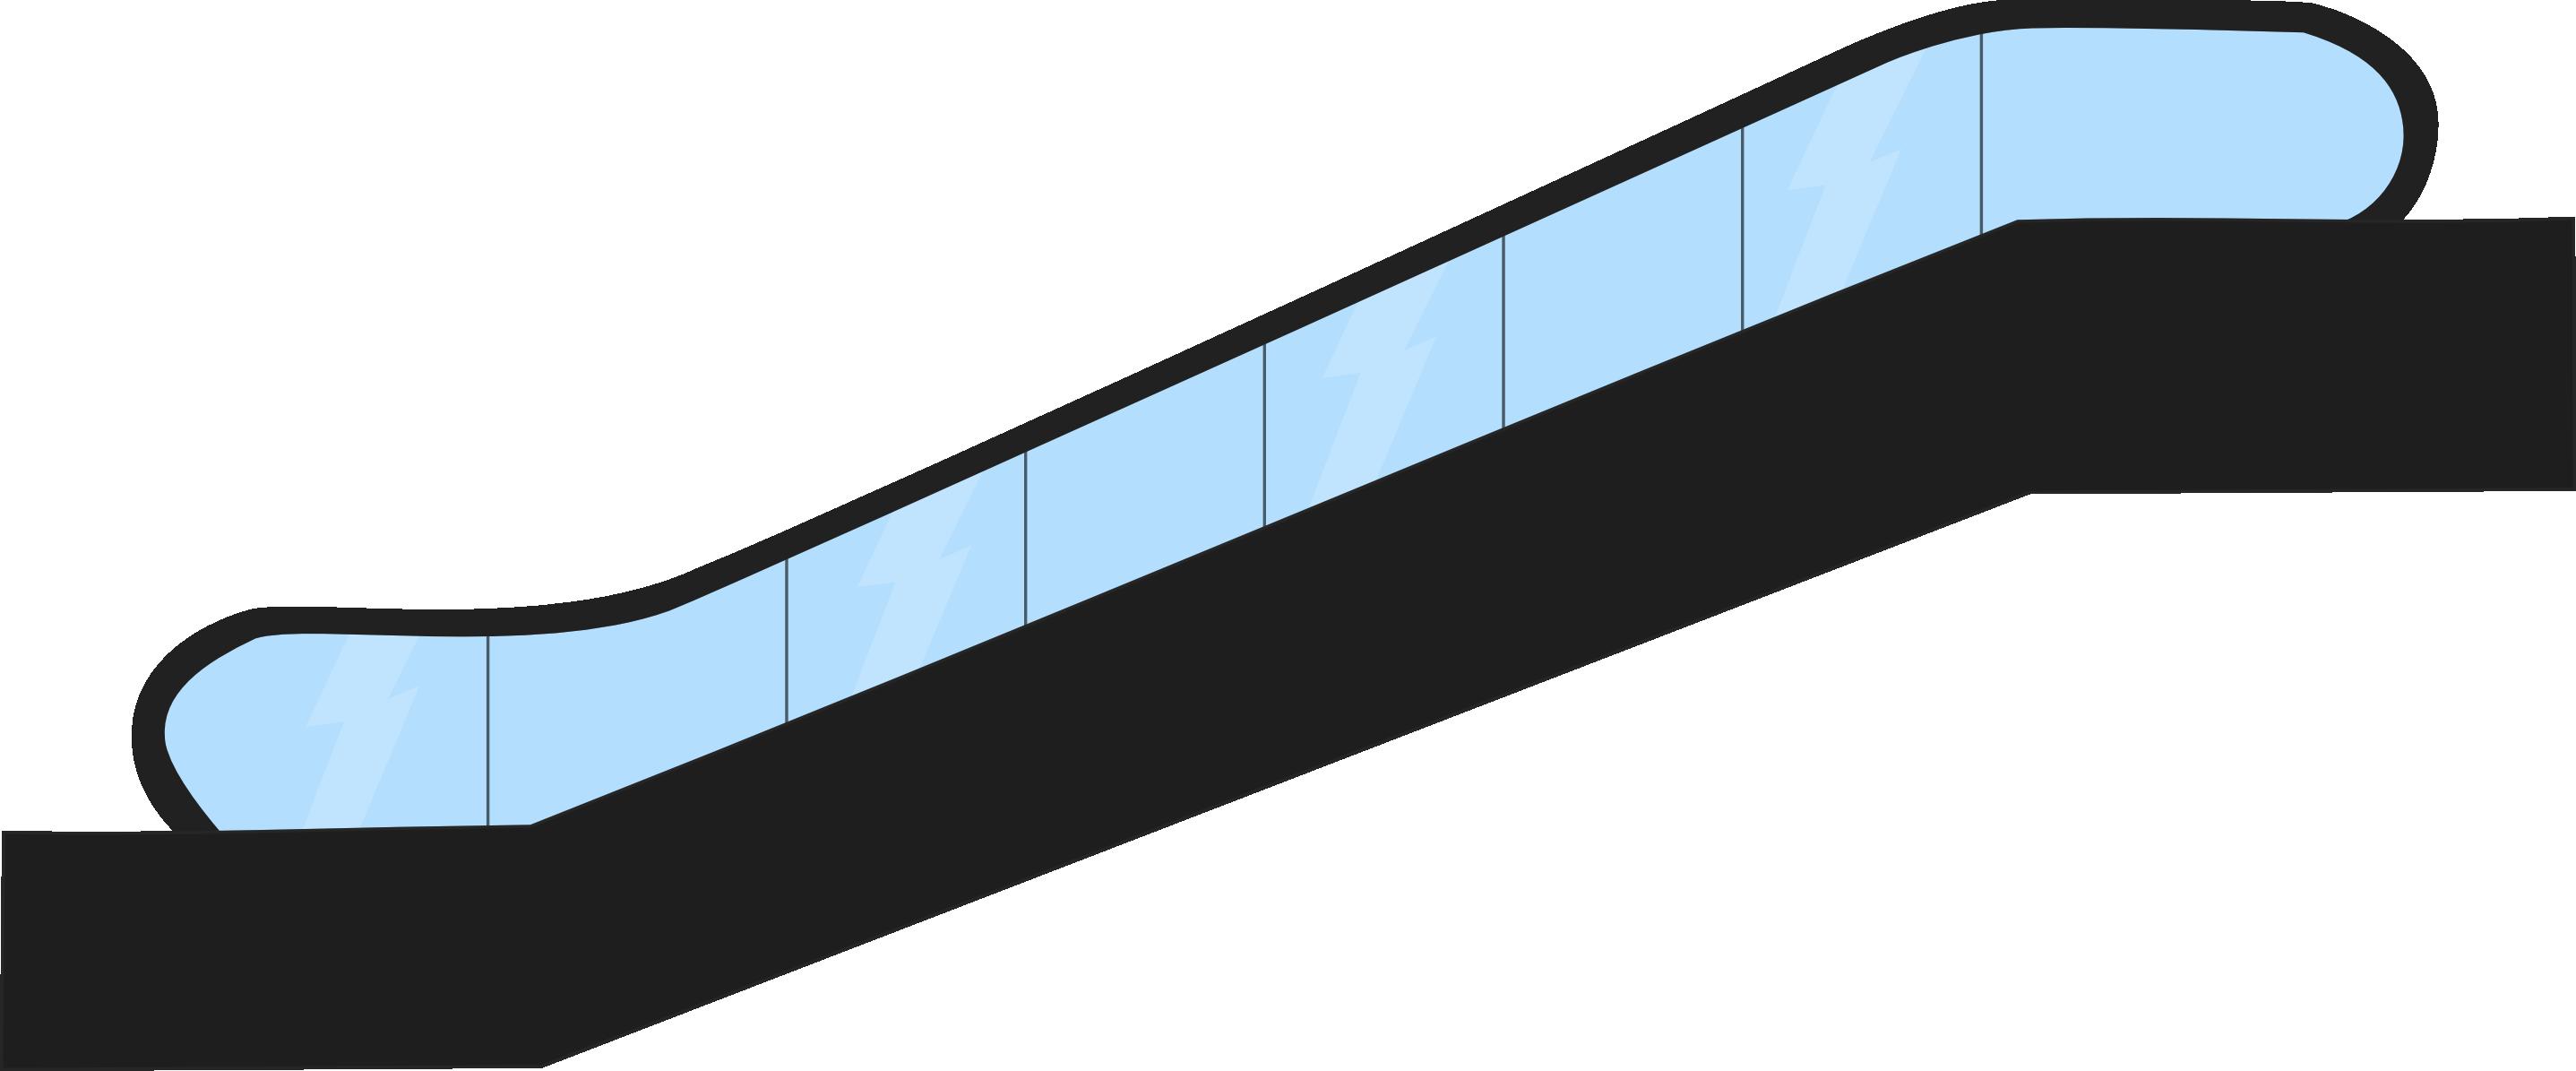 Escalator clipart #6